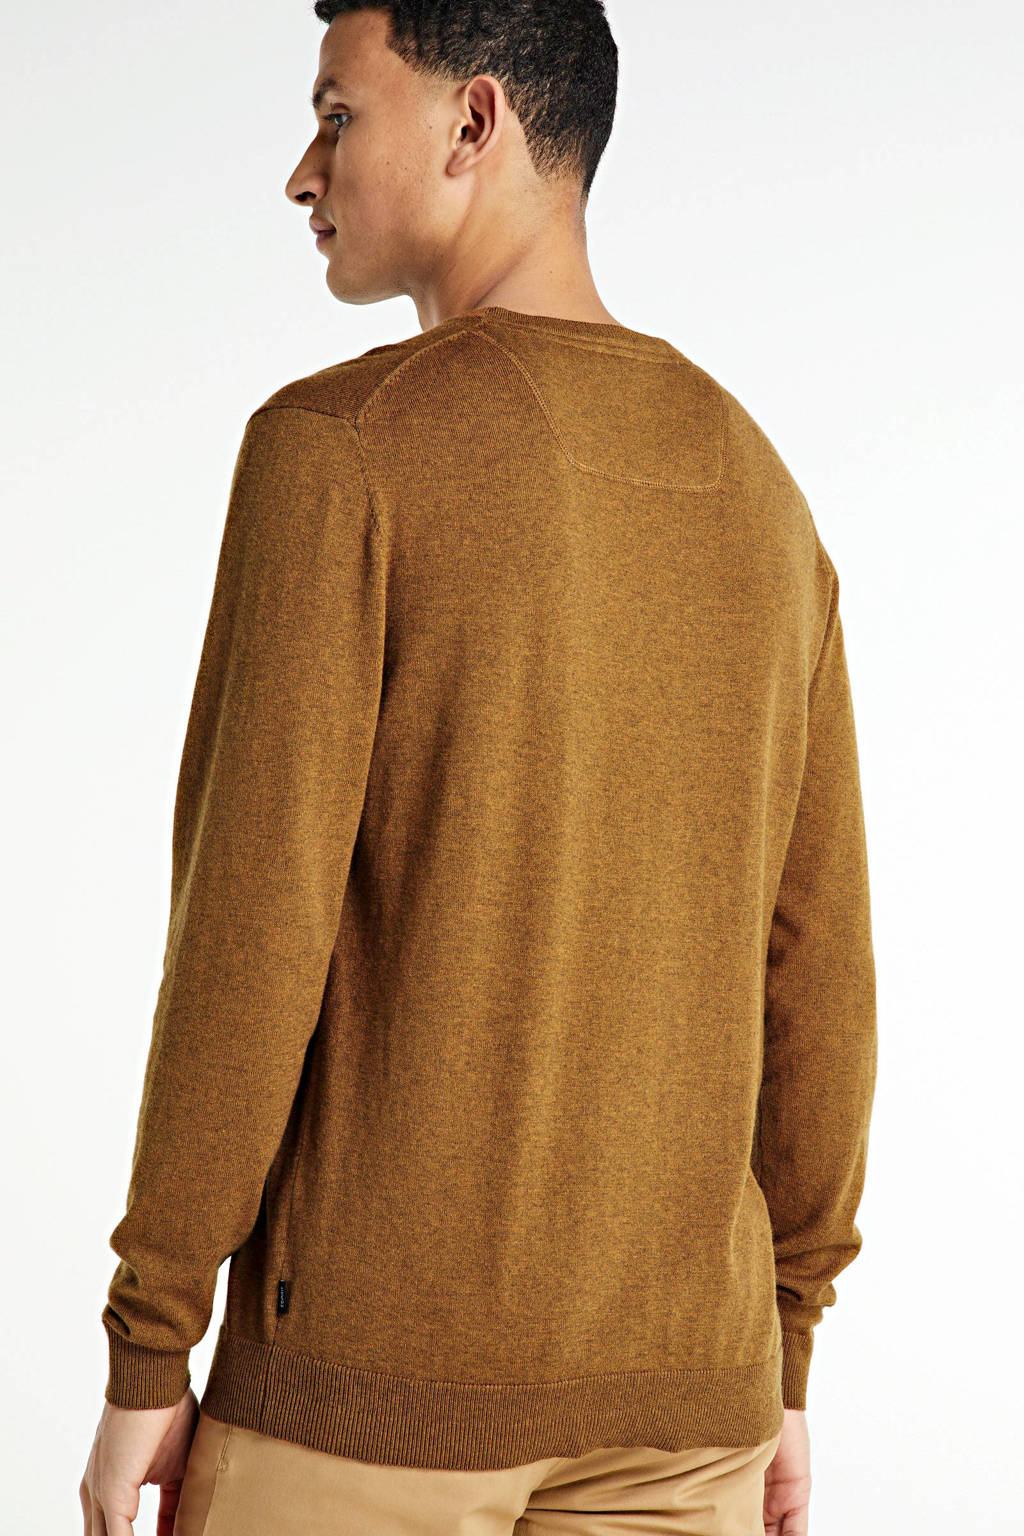 ESPRIT Men Casual fijngebreide trui camel, Camel